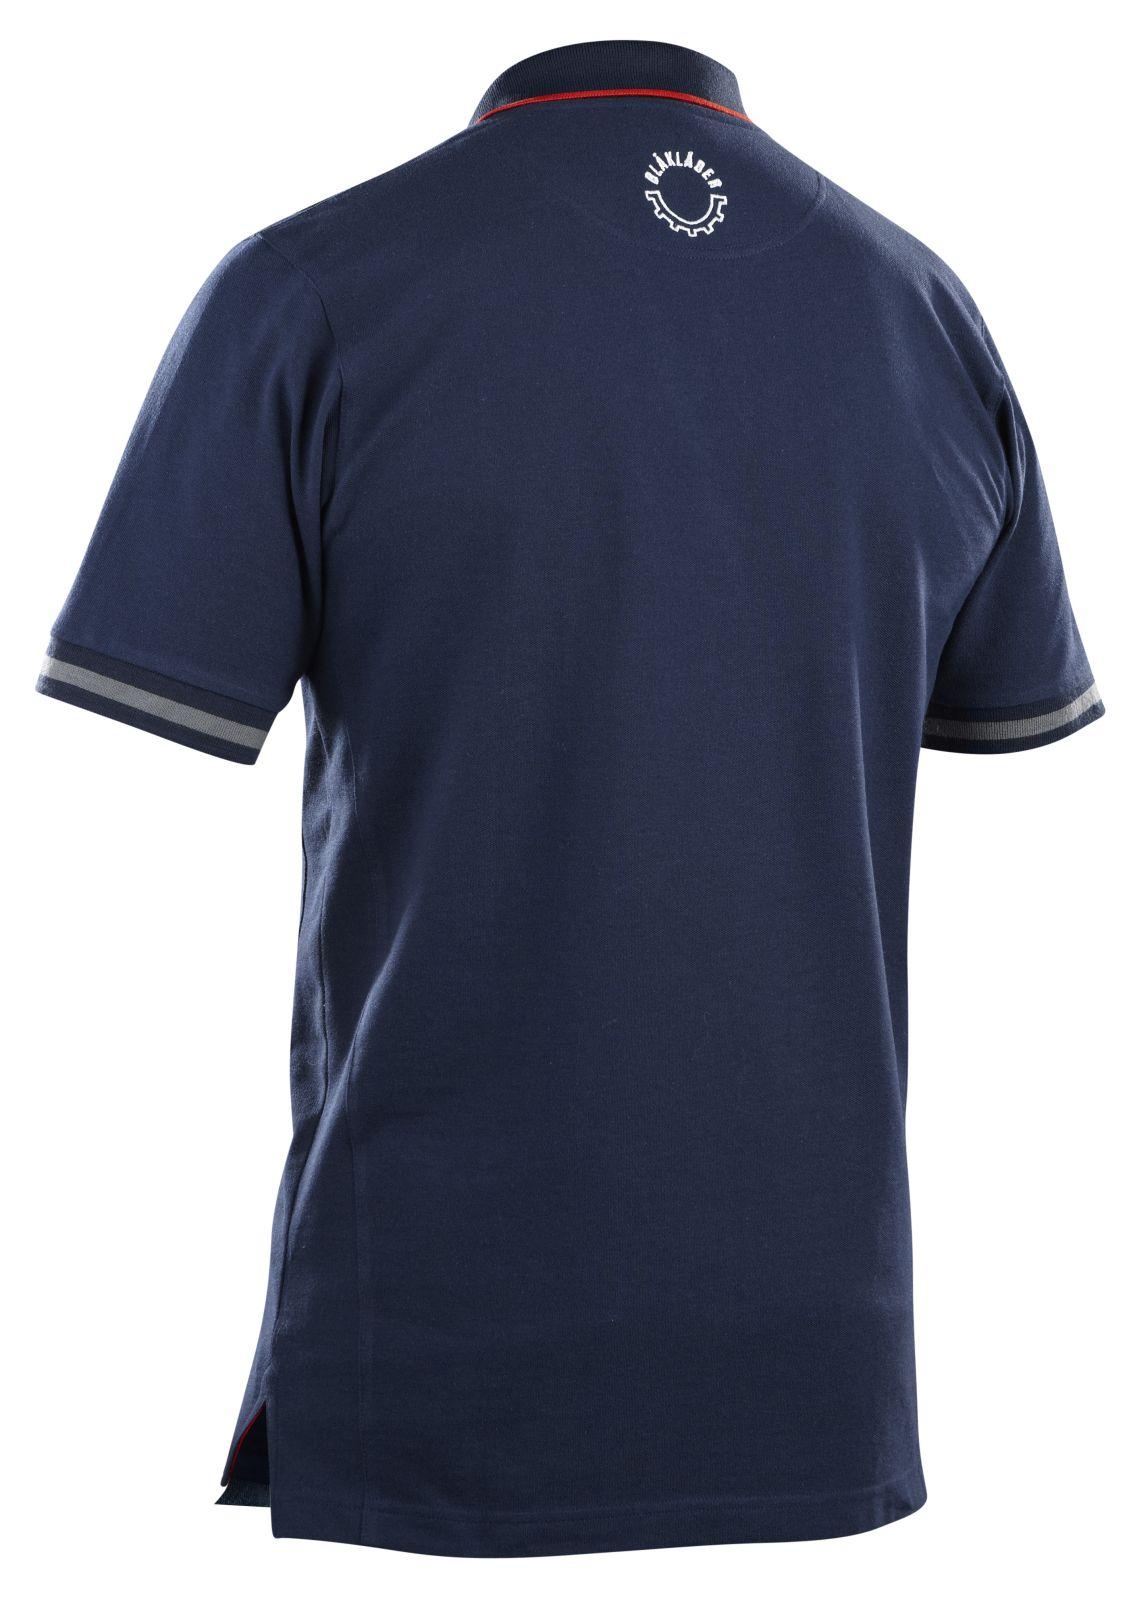 Blaklader Poloshirts 33271050 marineblauw-rood(8956)